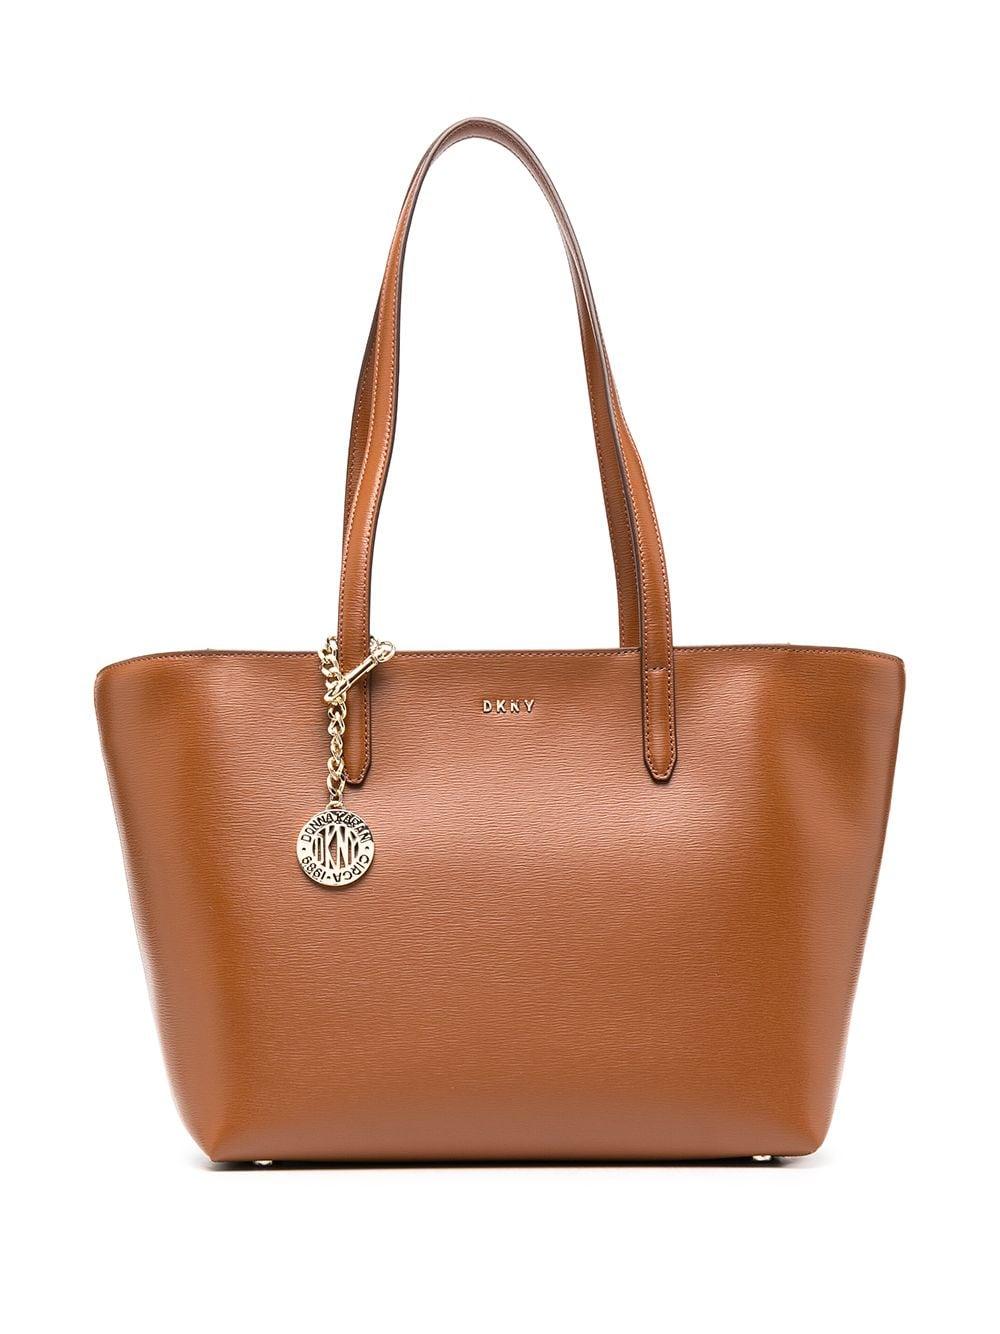 Bryant Leather Bag